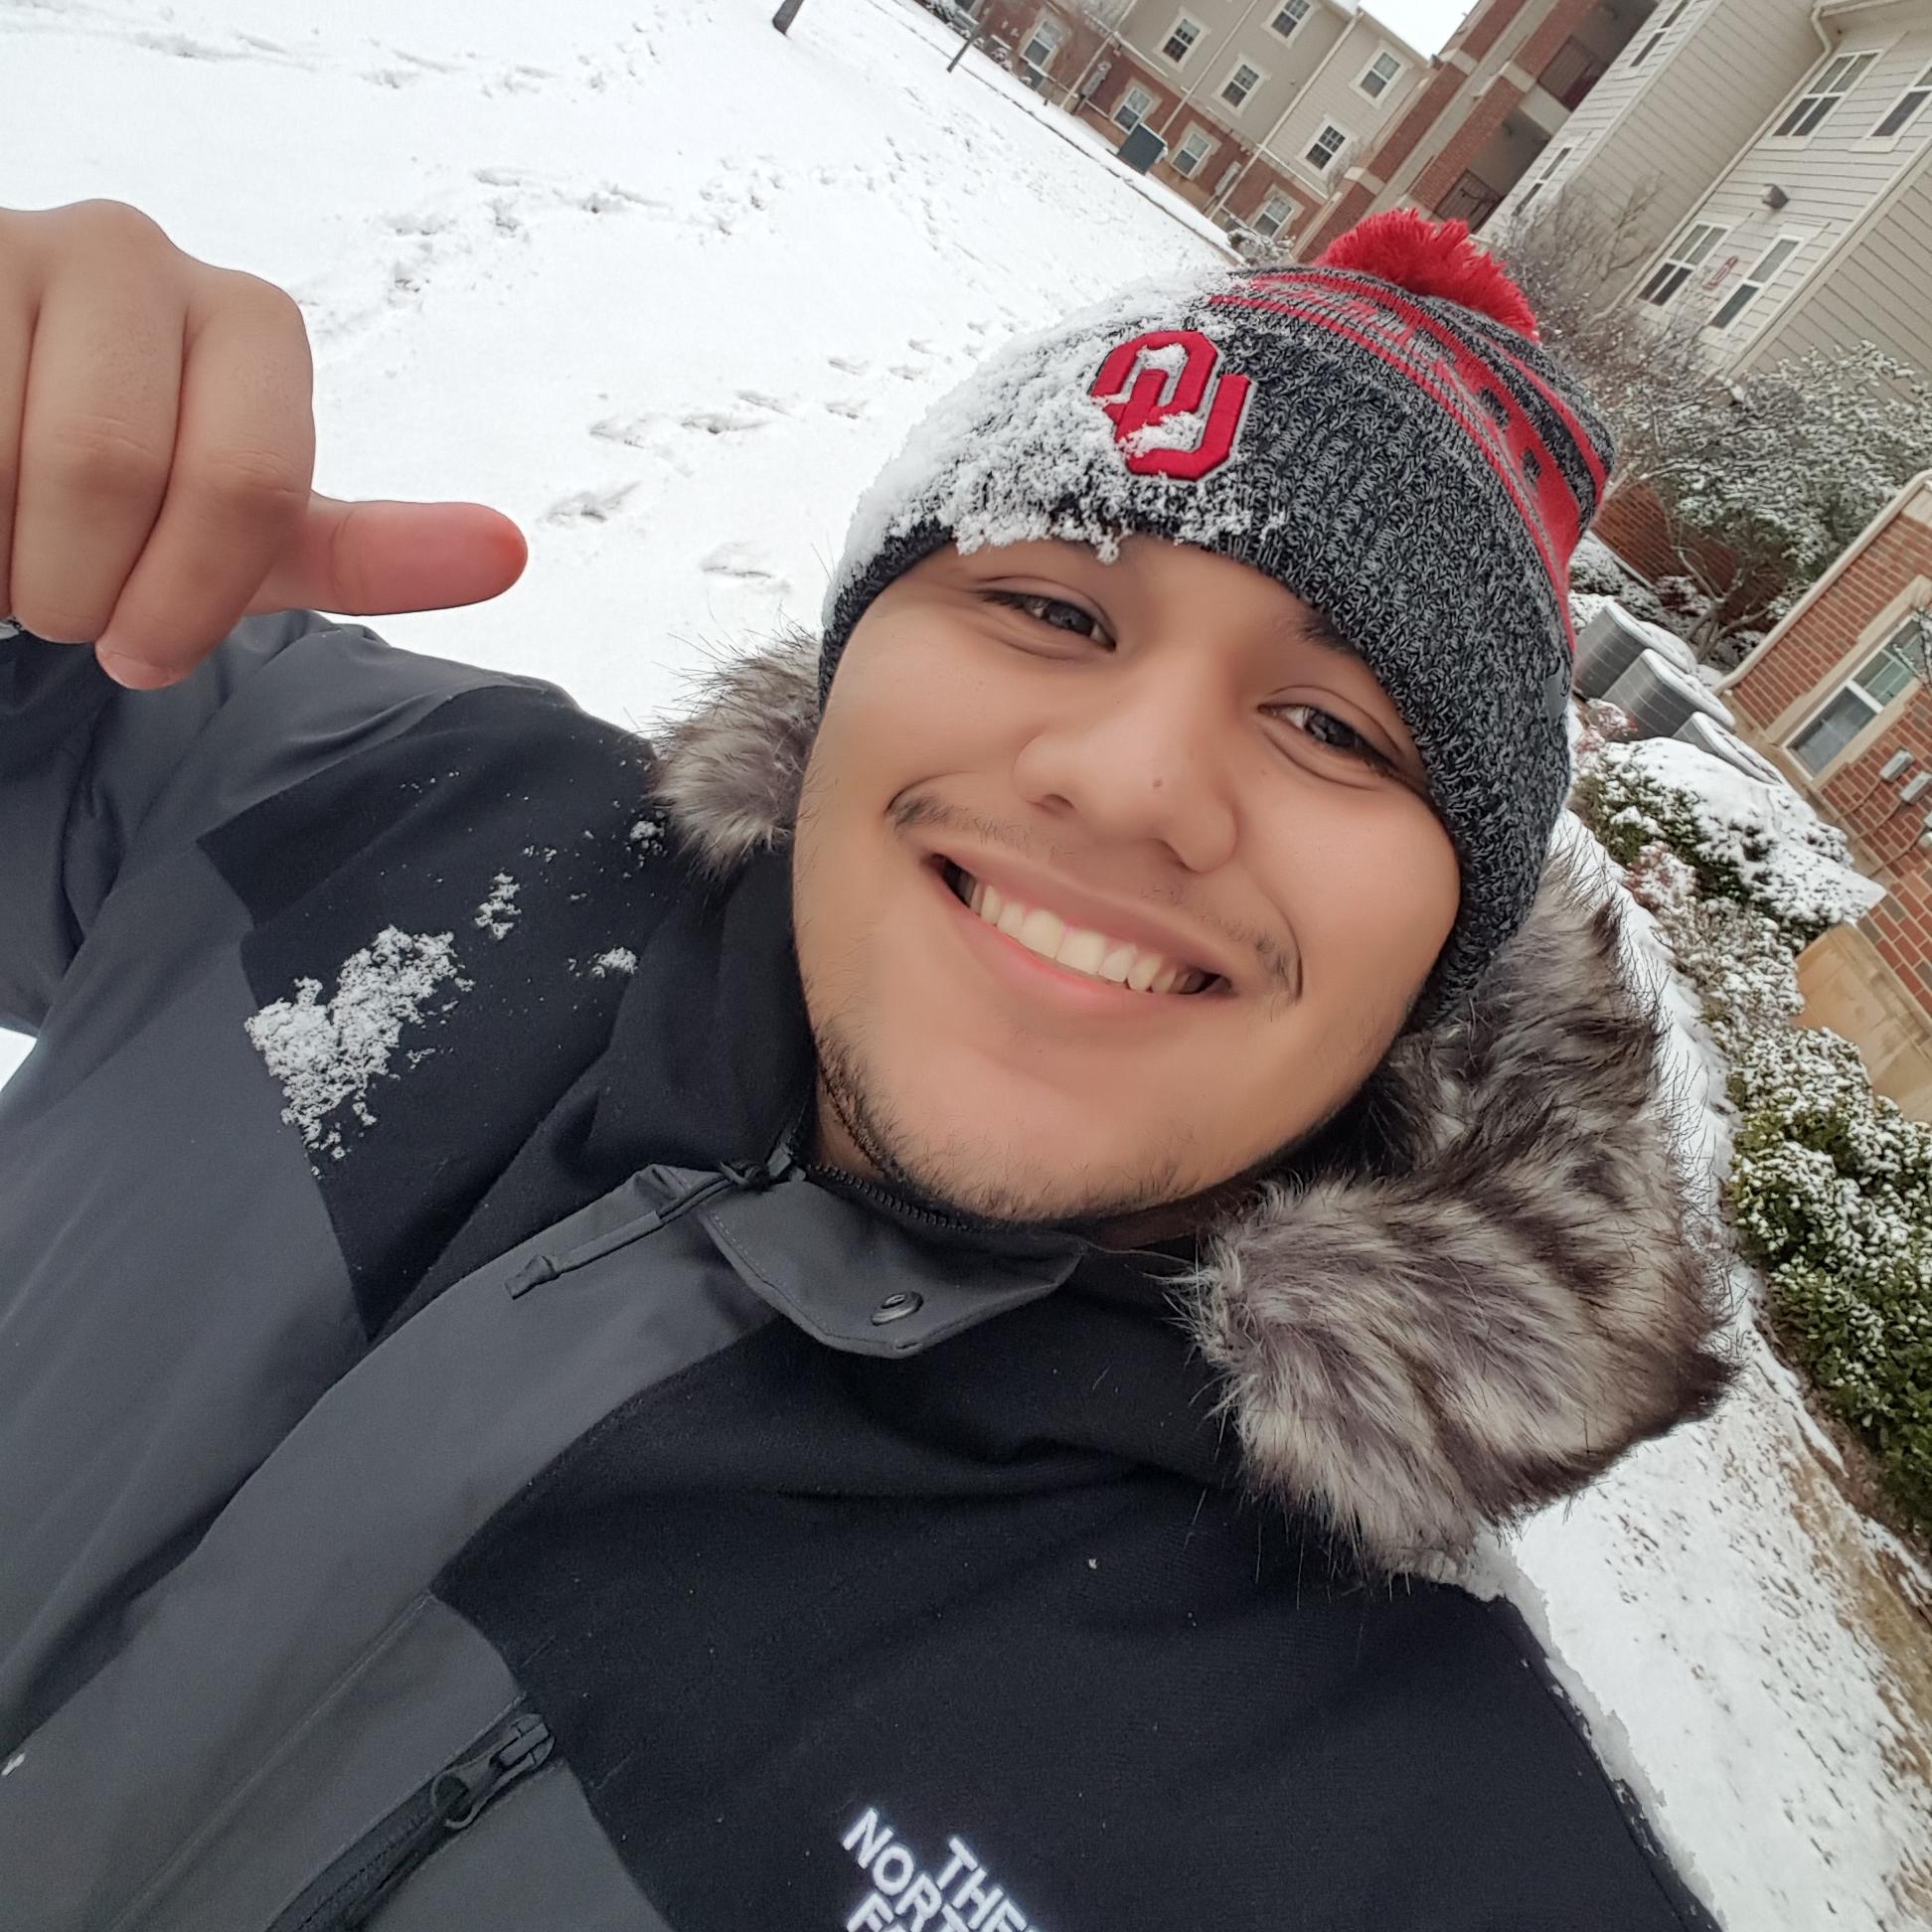 Christian Alvarez from University of Oklahoma